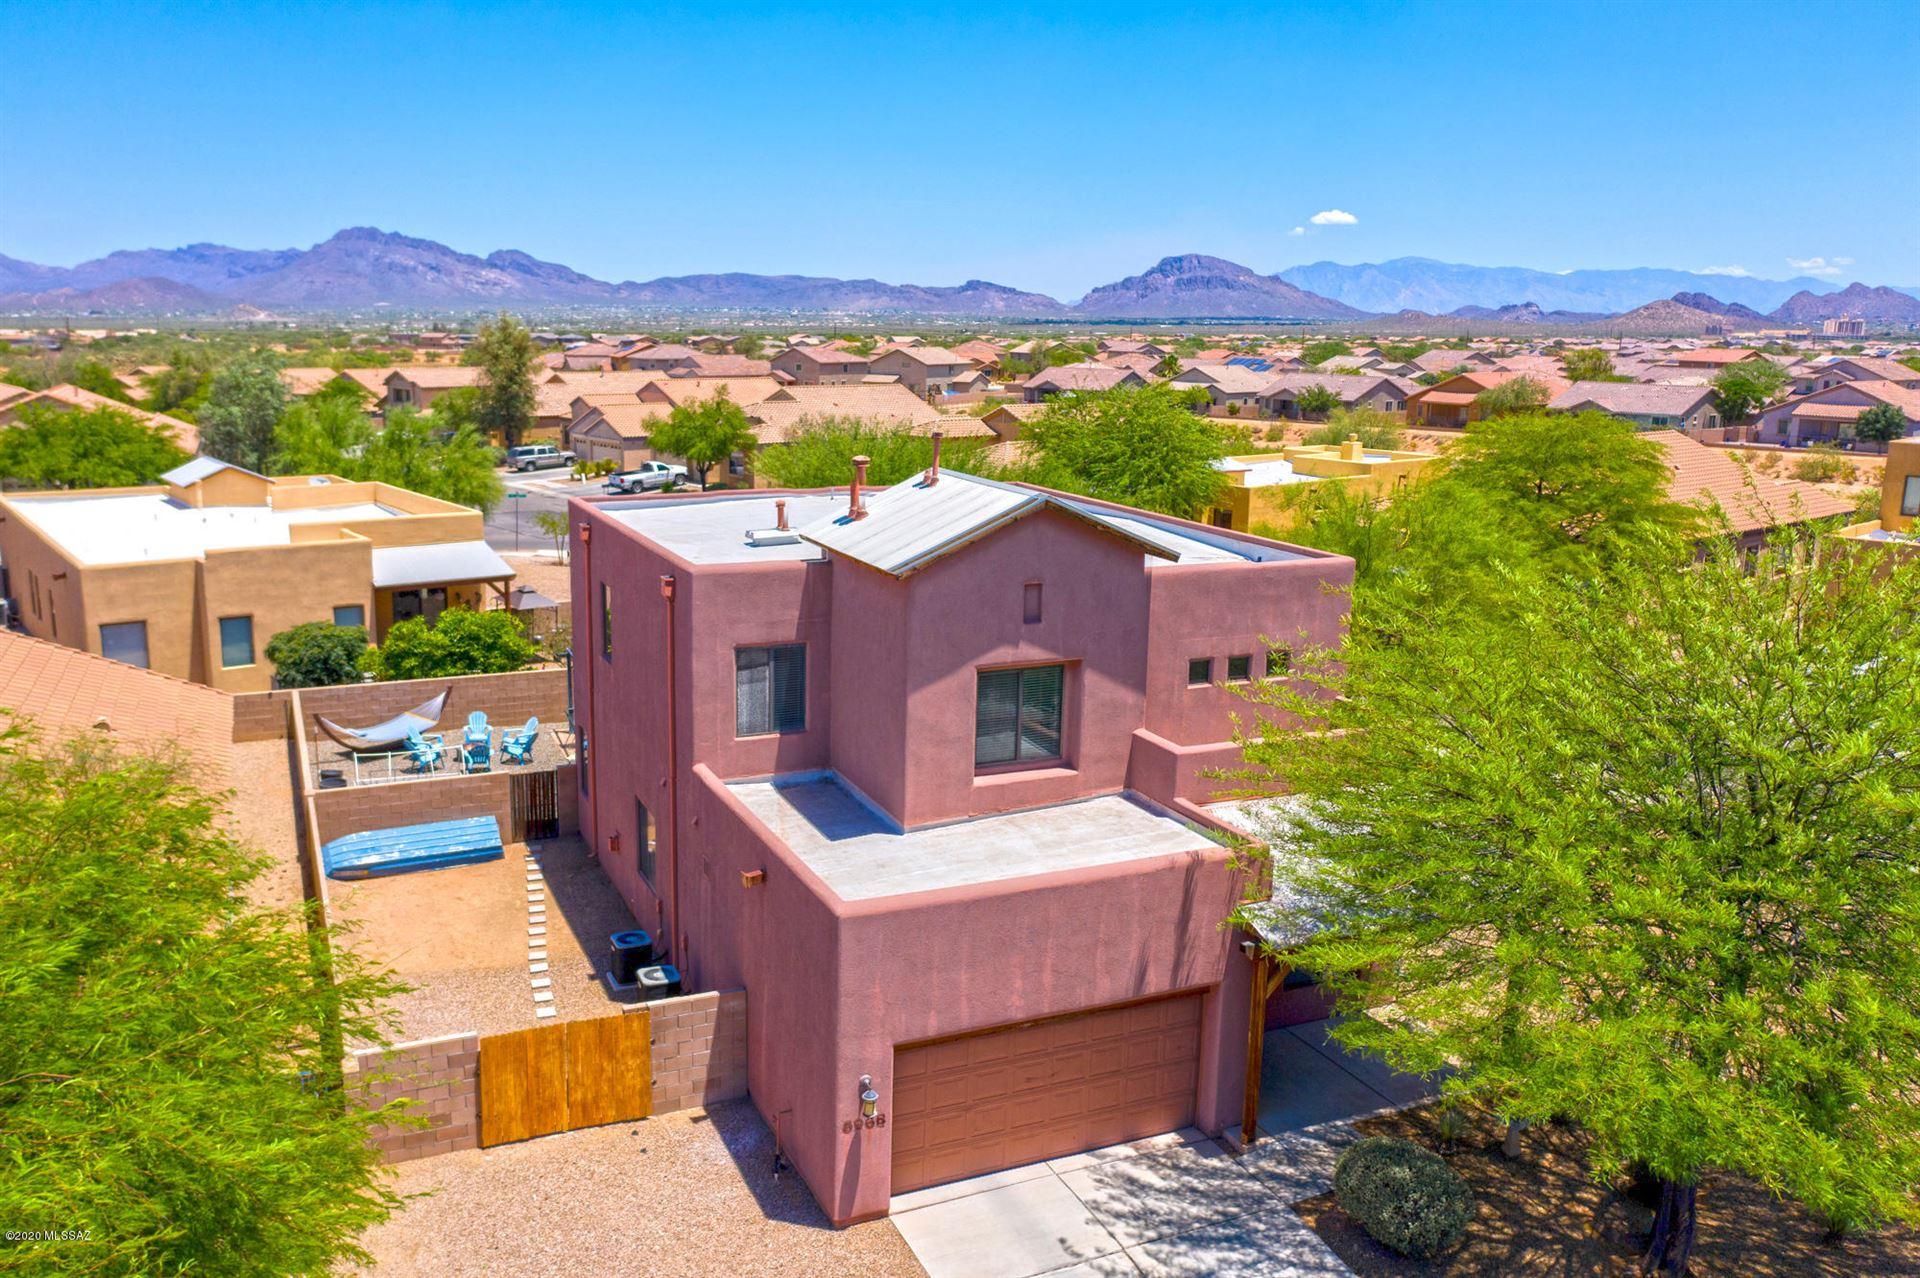 6968 W Dupont Way, Tucson, AZ 85757 - MLS#: 22014689